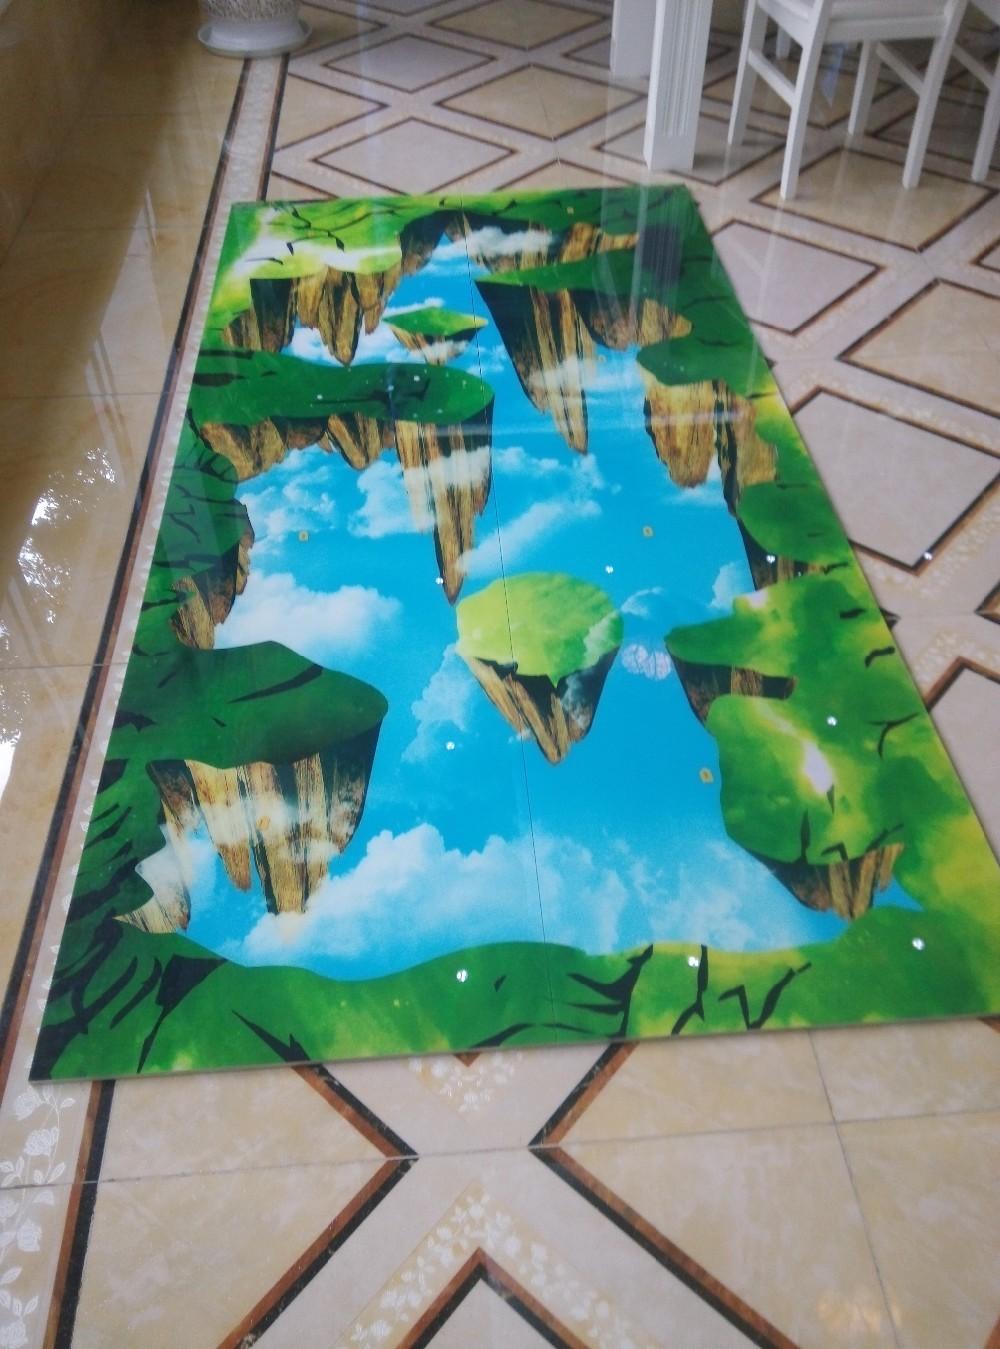 Japan quality kitchen mosaic backsplash glass tile backsplashes ...